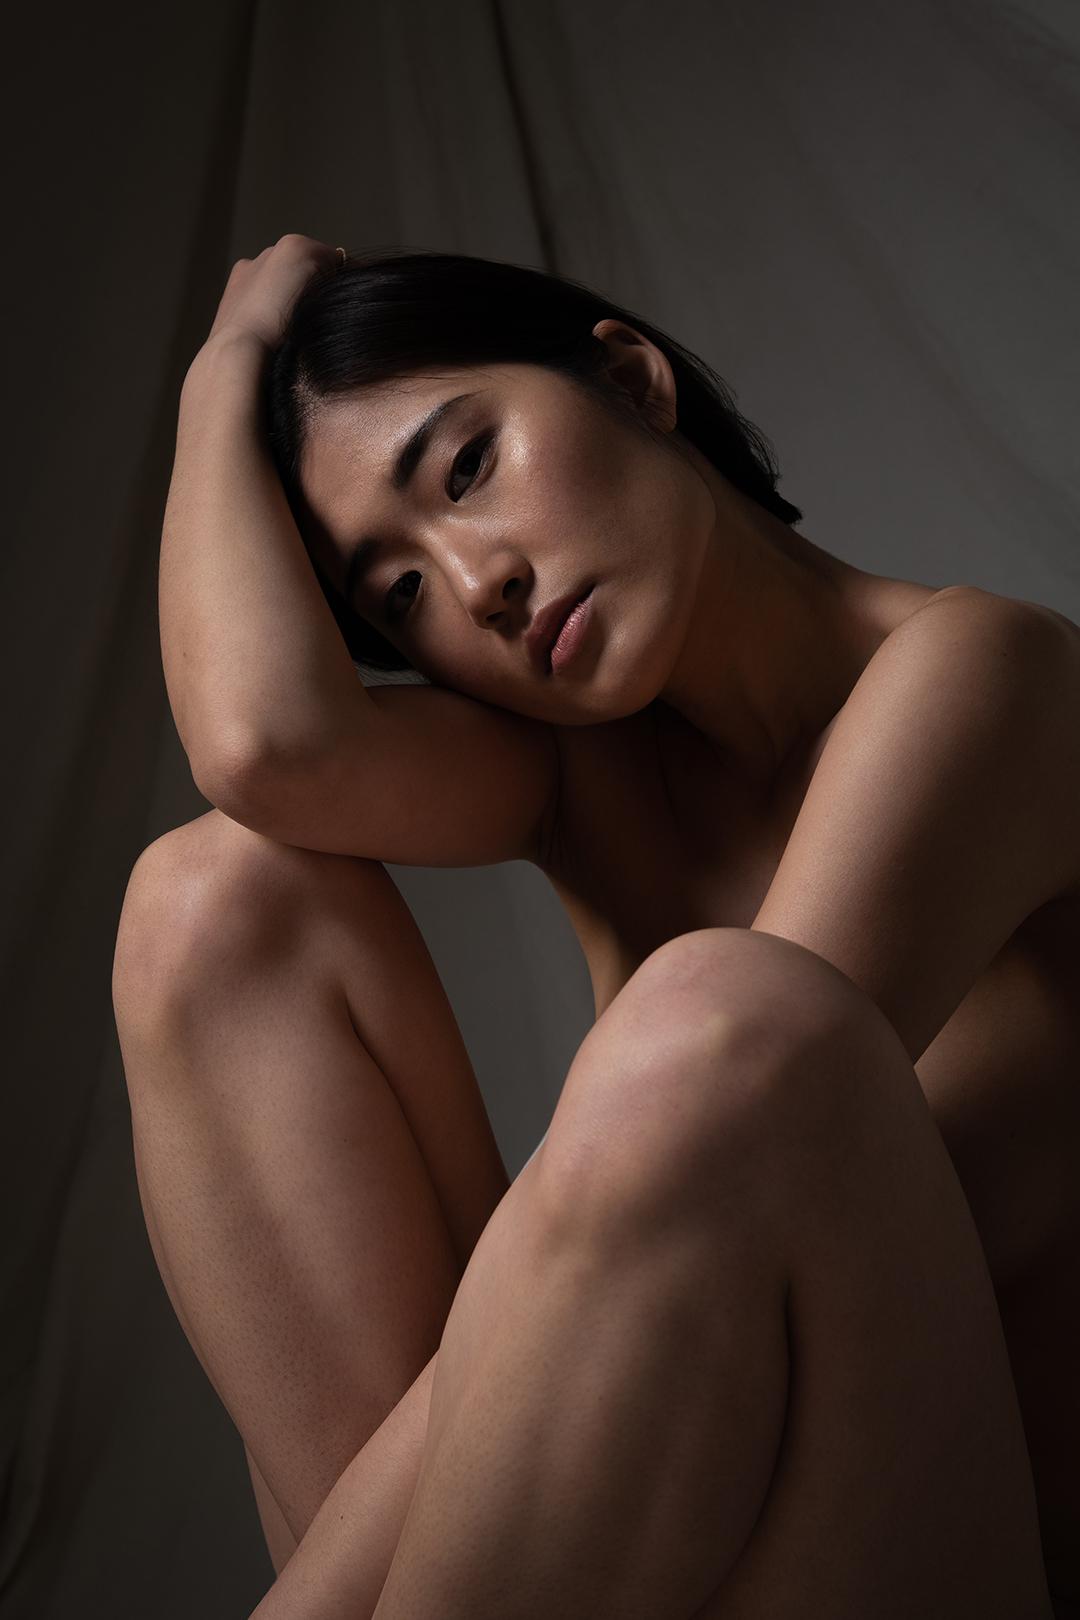 Taehee nude